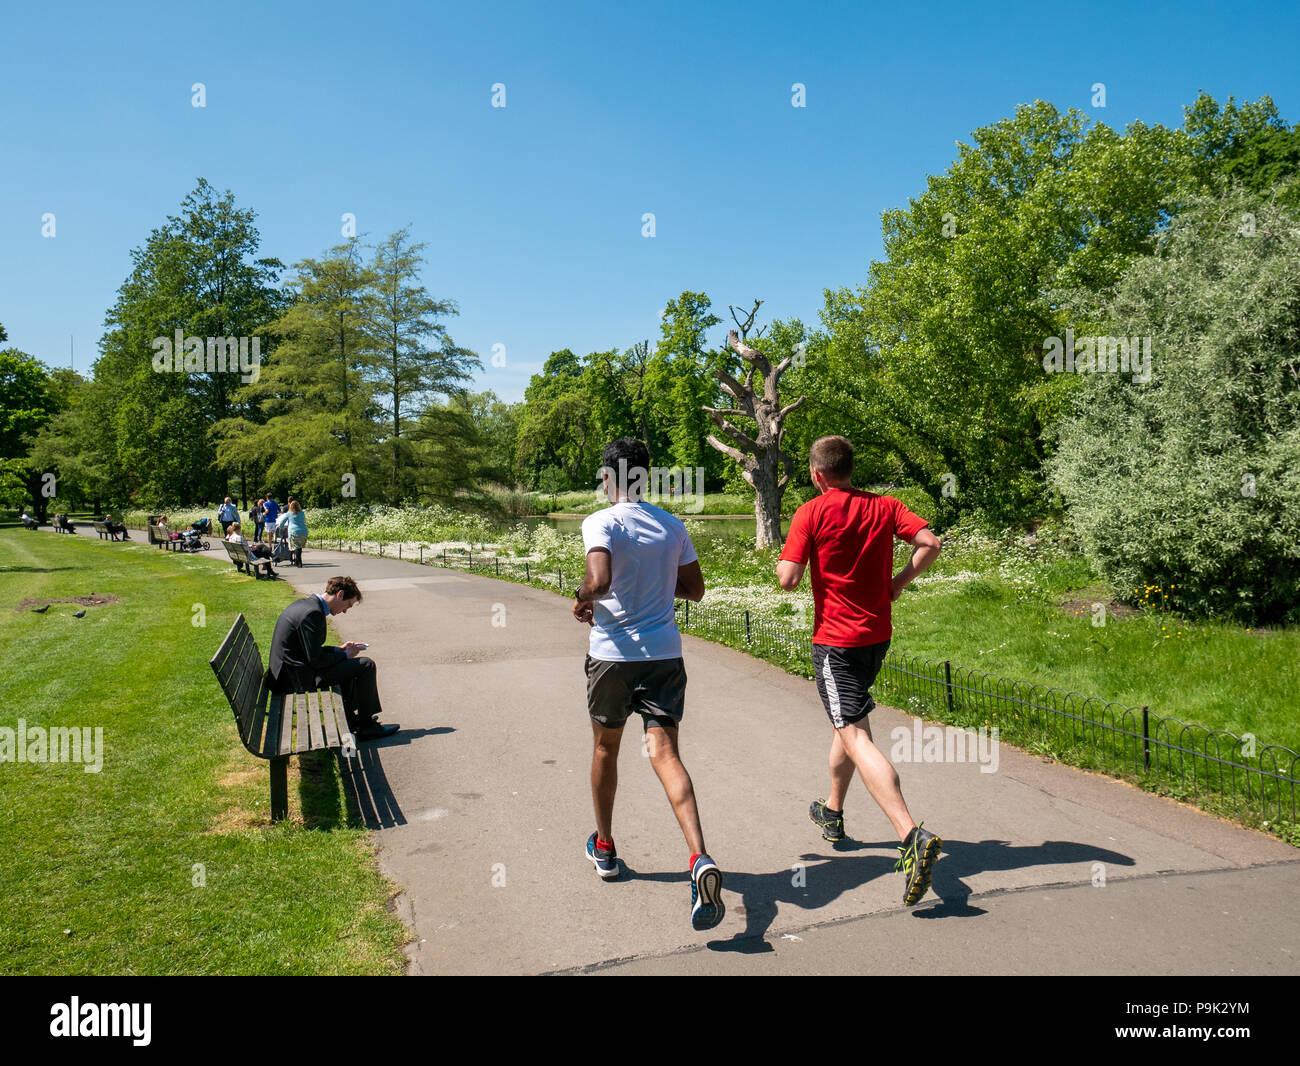 Joggers running at Regent's Park, London, UK Stock Photo